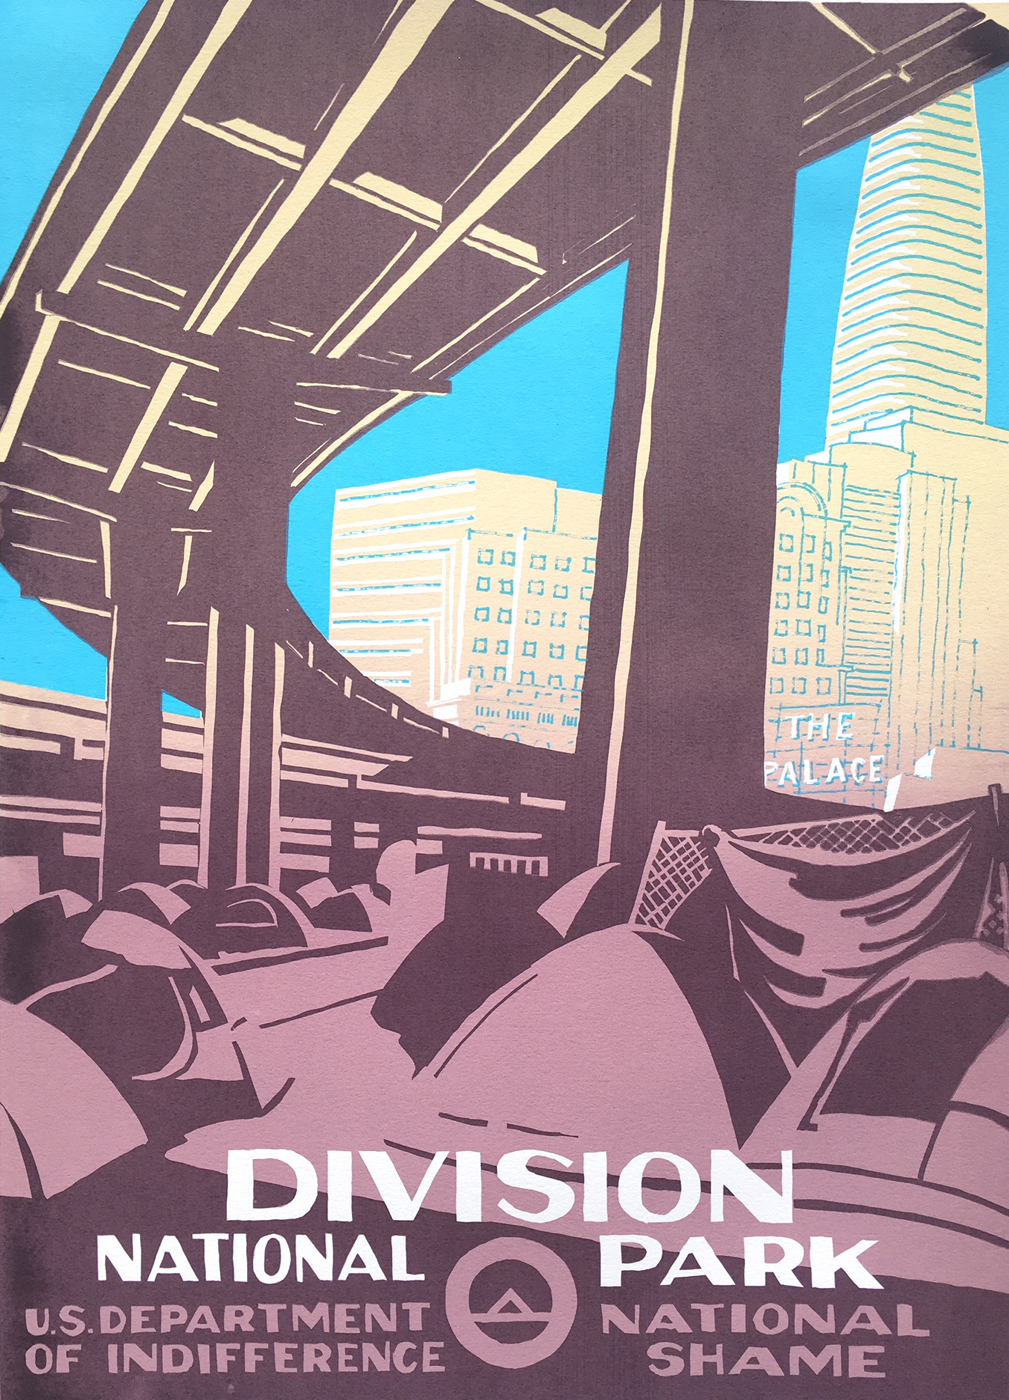 Final Division National Park Poster